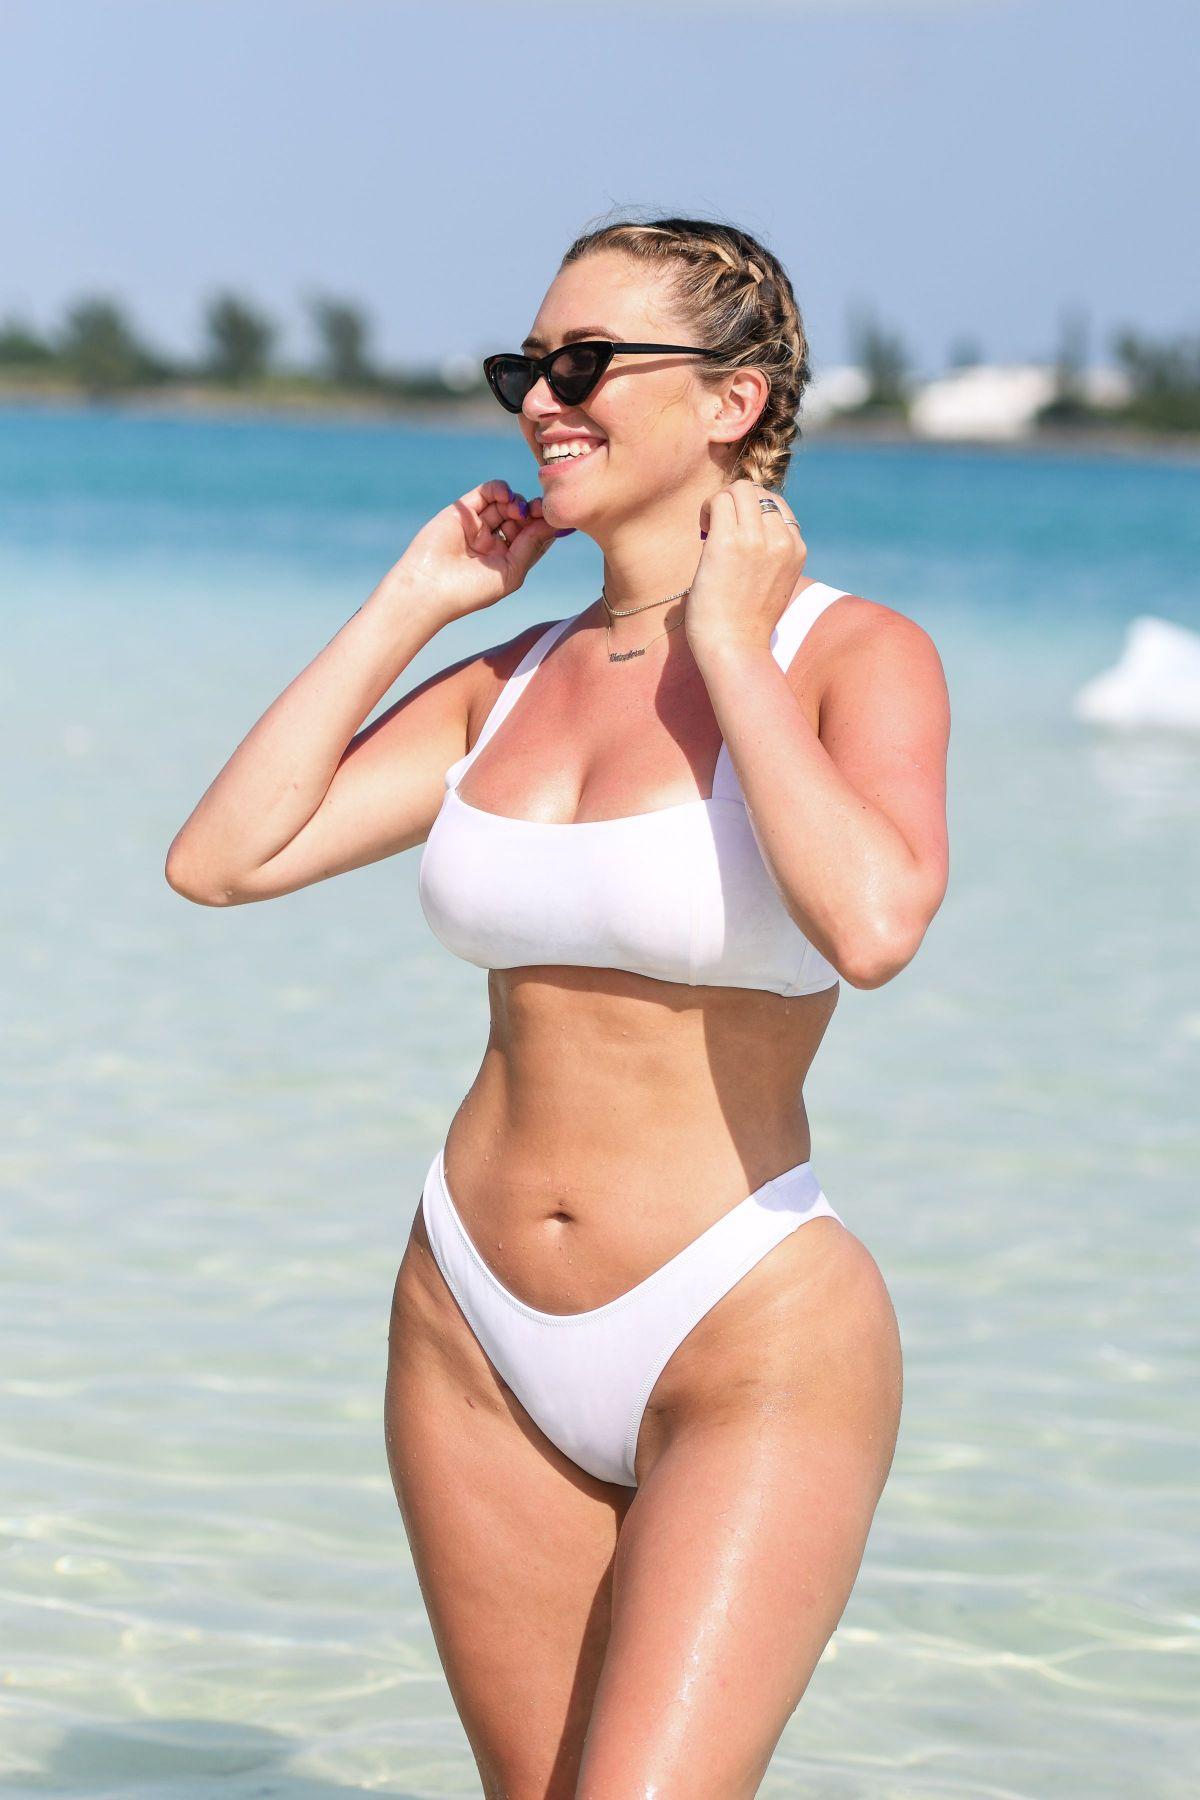 b06d7bea26b47 ANASTASIA KARANIKOLAOU in Bikini at Revolve Summer Event in Bermuda 07 17  2018